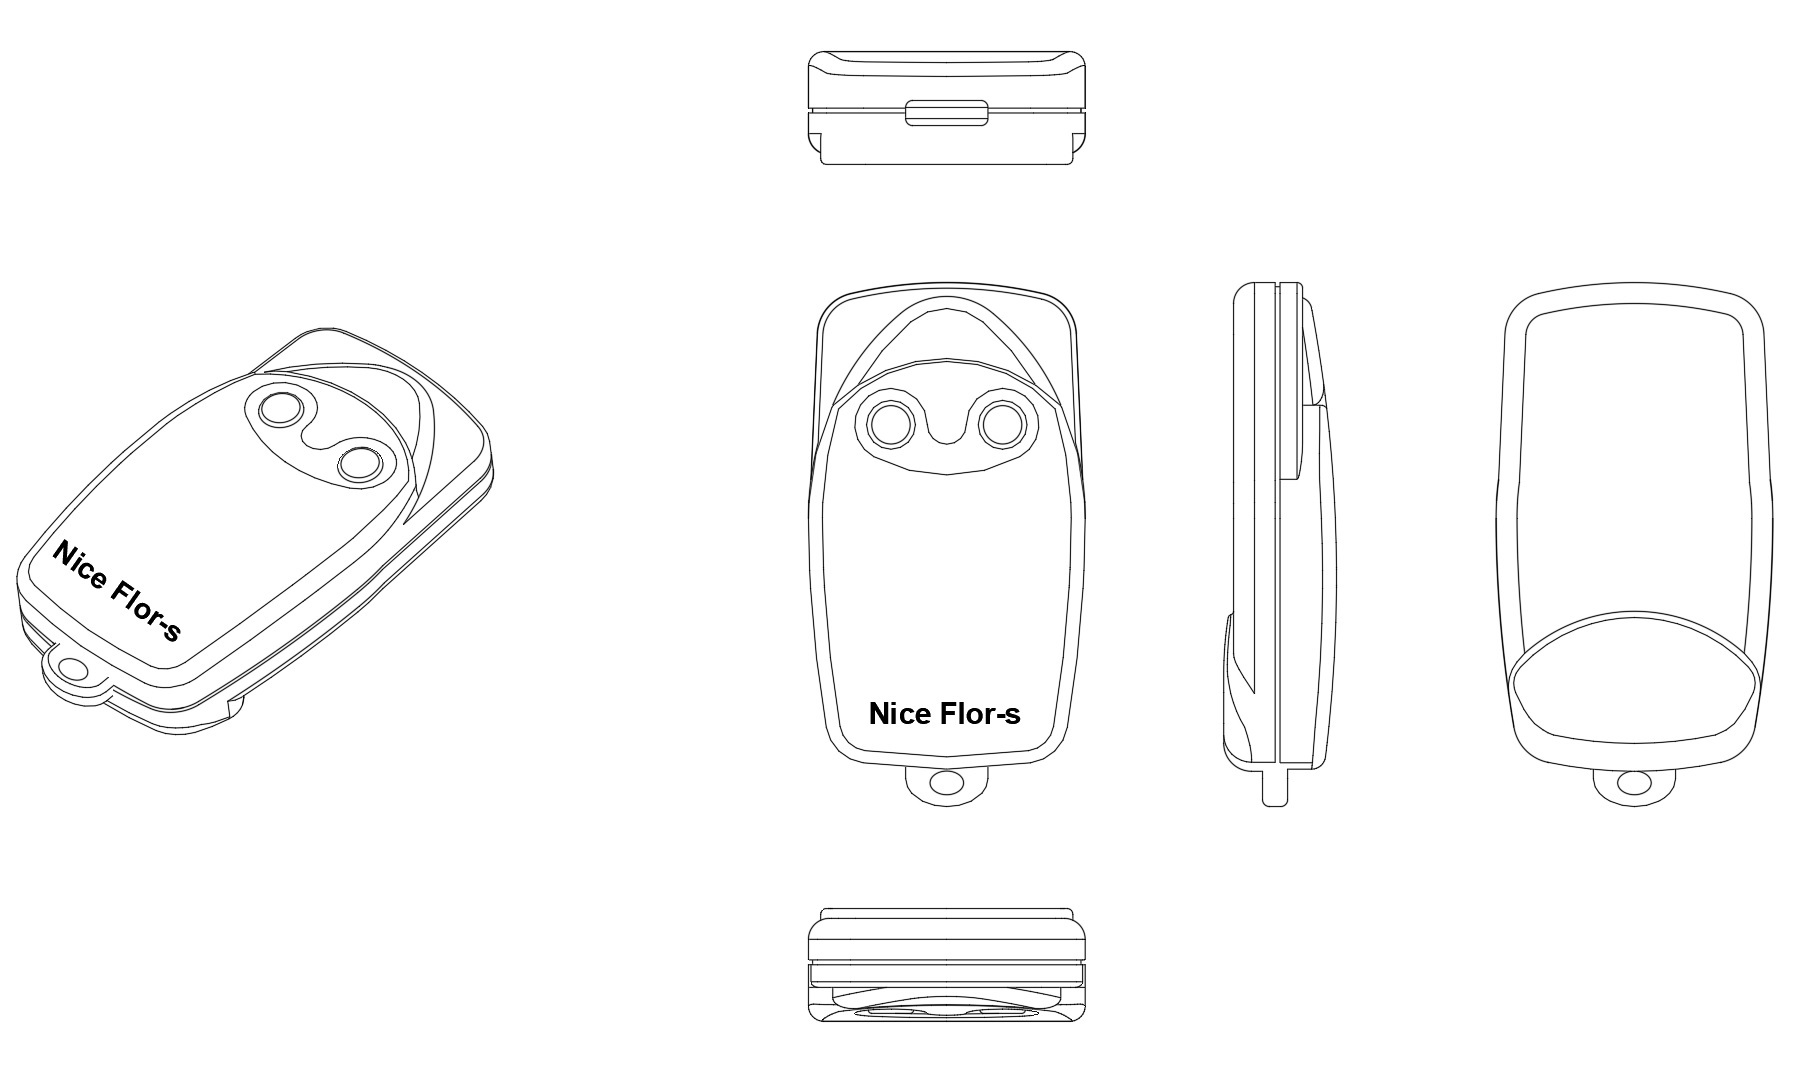 3D-Marke: NICE FLOR-S